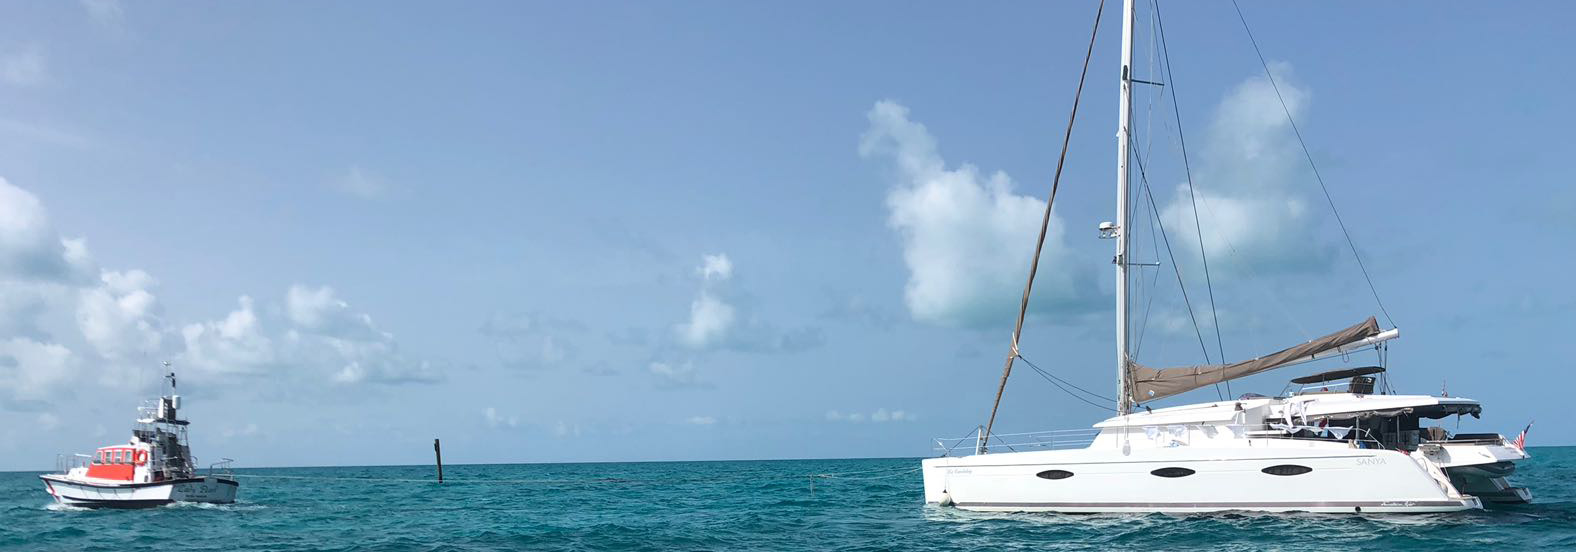 1-Bahamas-Marine-Towing-Salvage-services